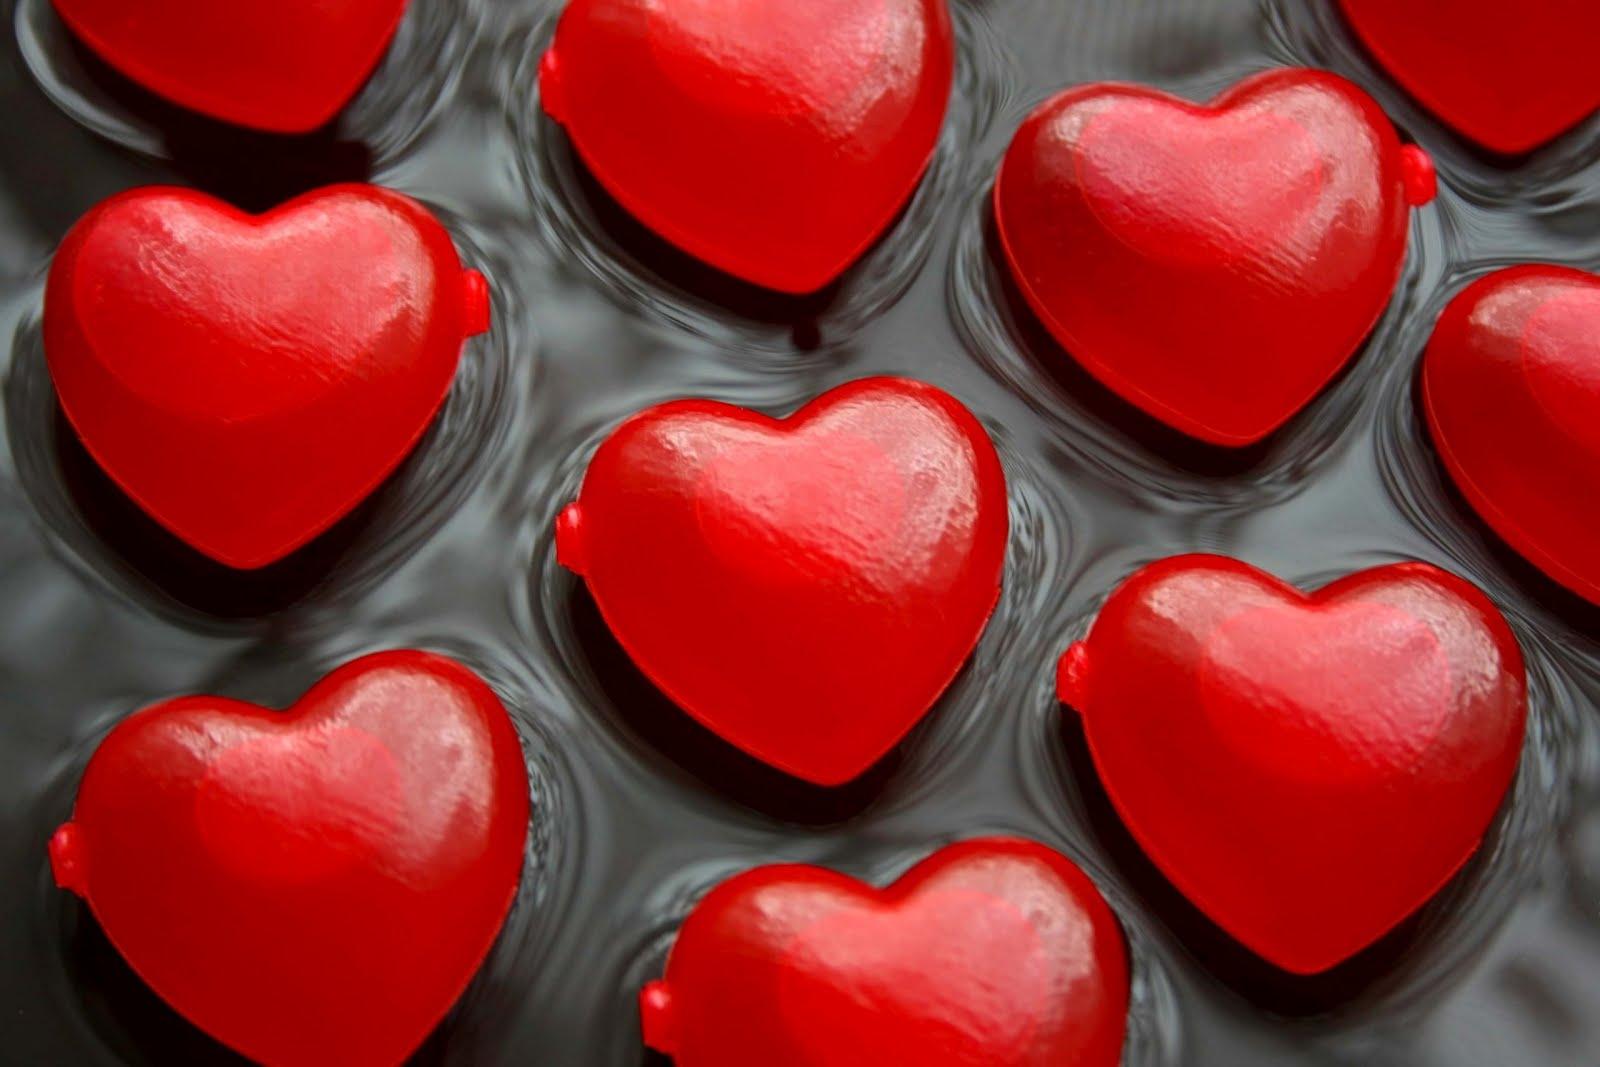 Weddingzilla: Valentine's Day Love, Share the Love!